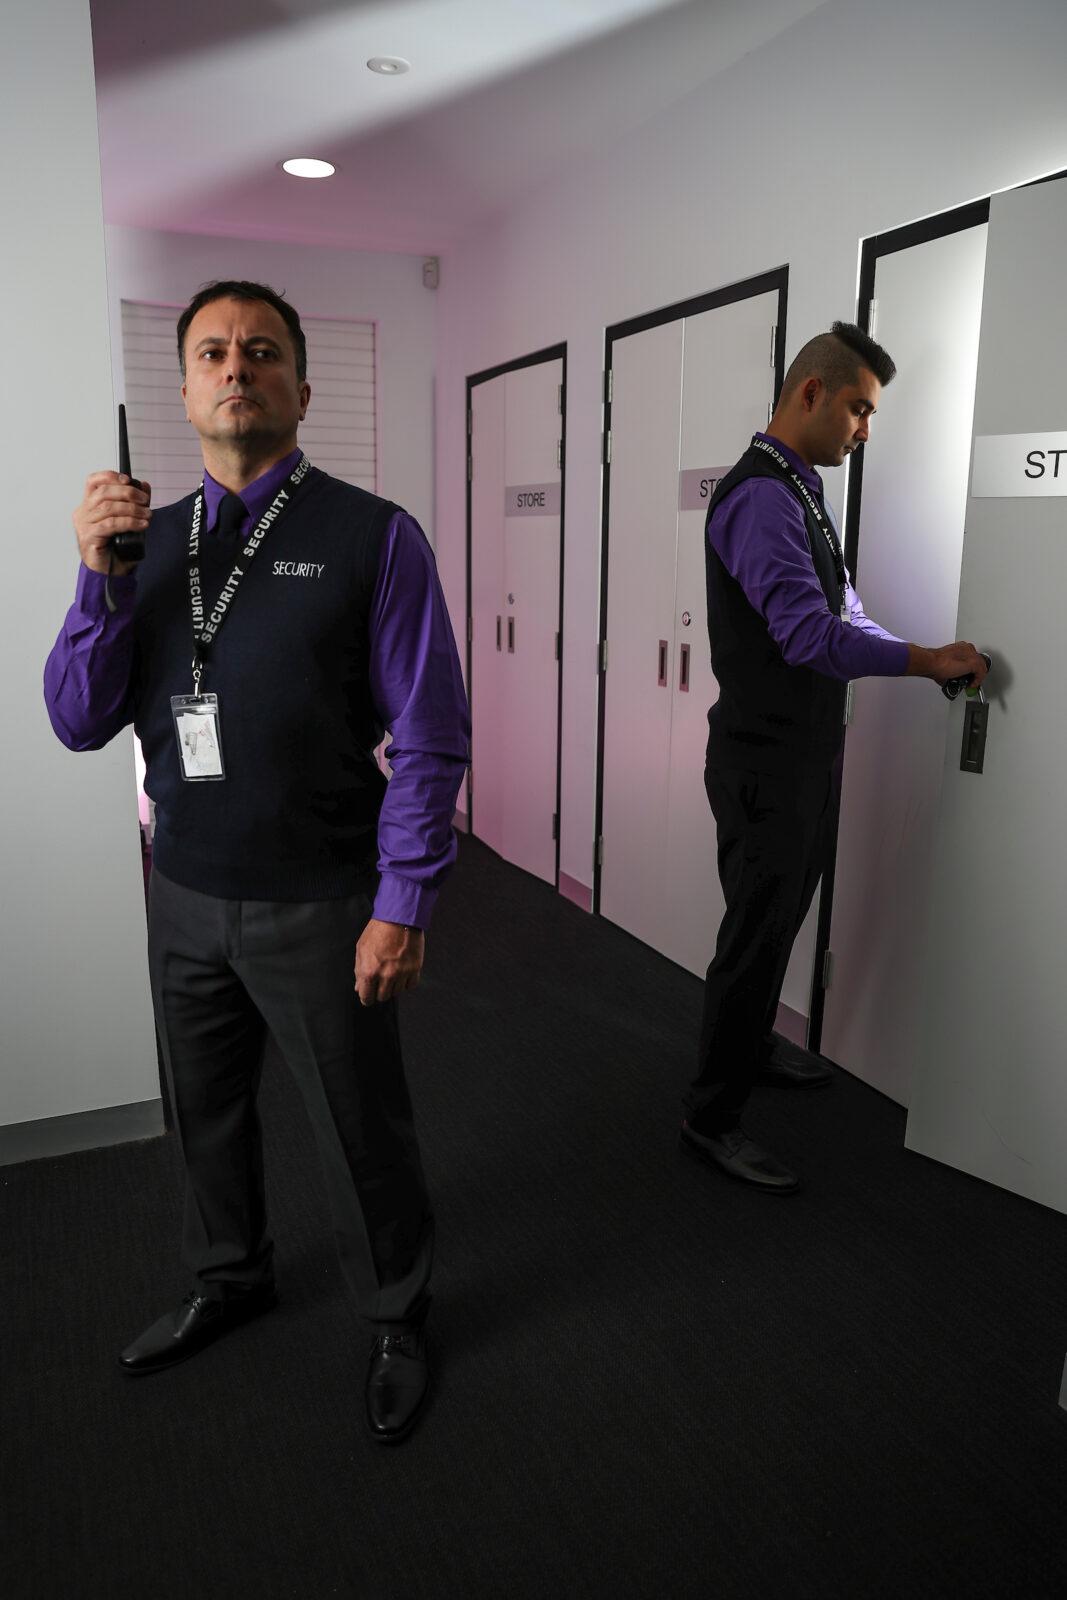 Melbourne Shopping Centre Security Companies